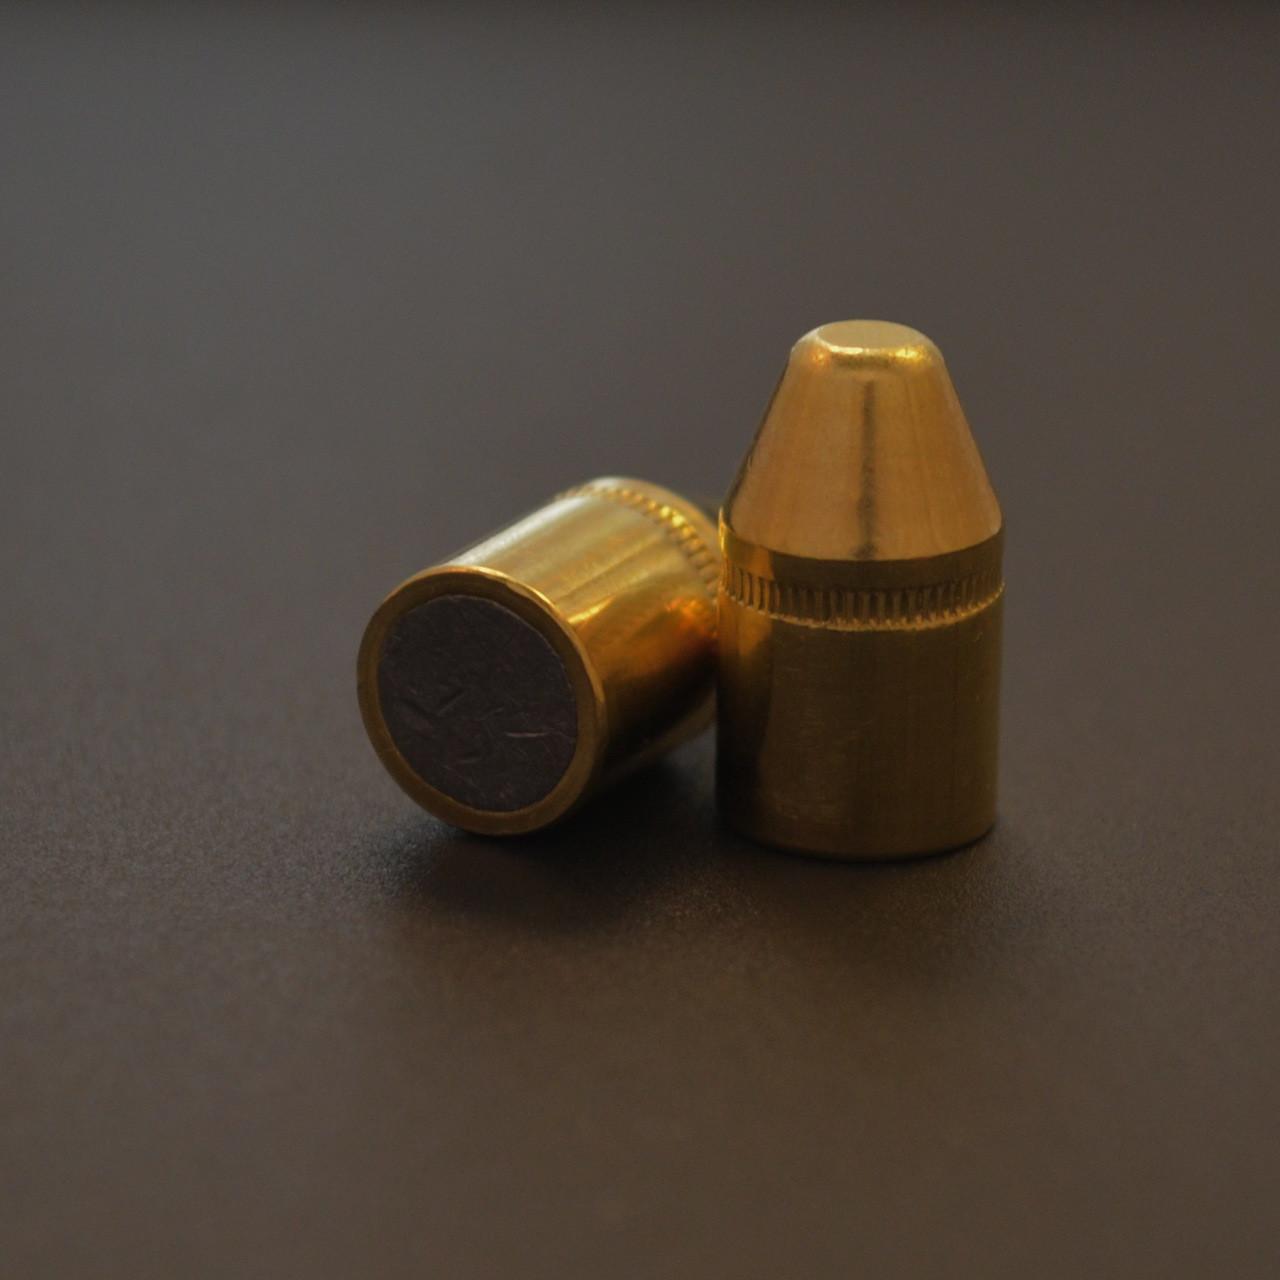 .38/142gr FMJ - 500ct revolver